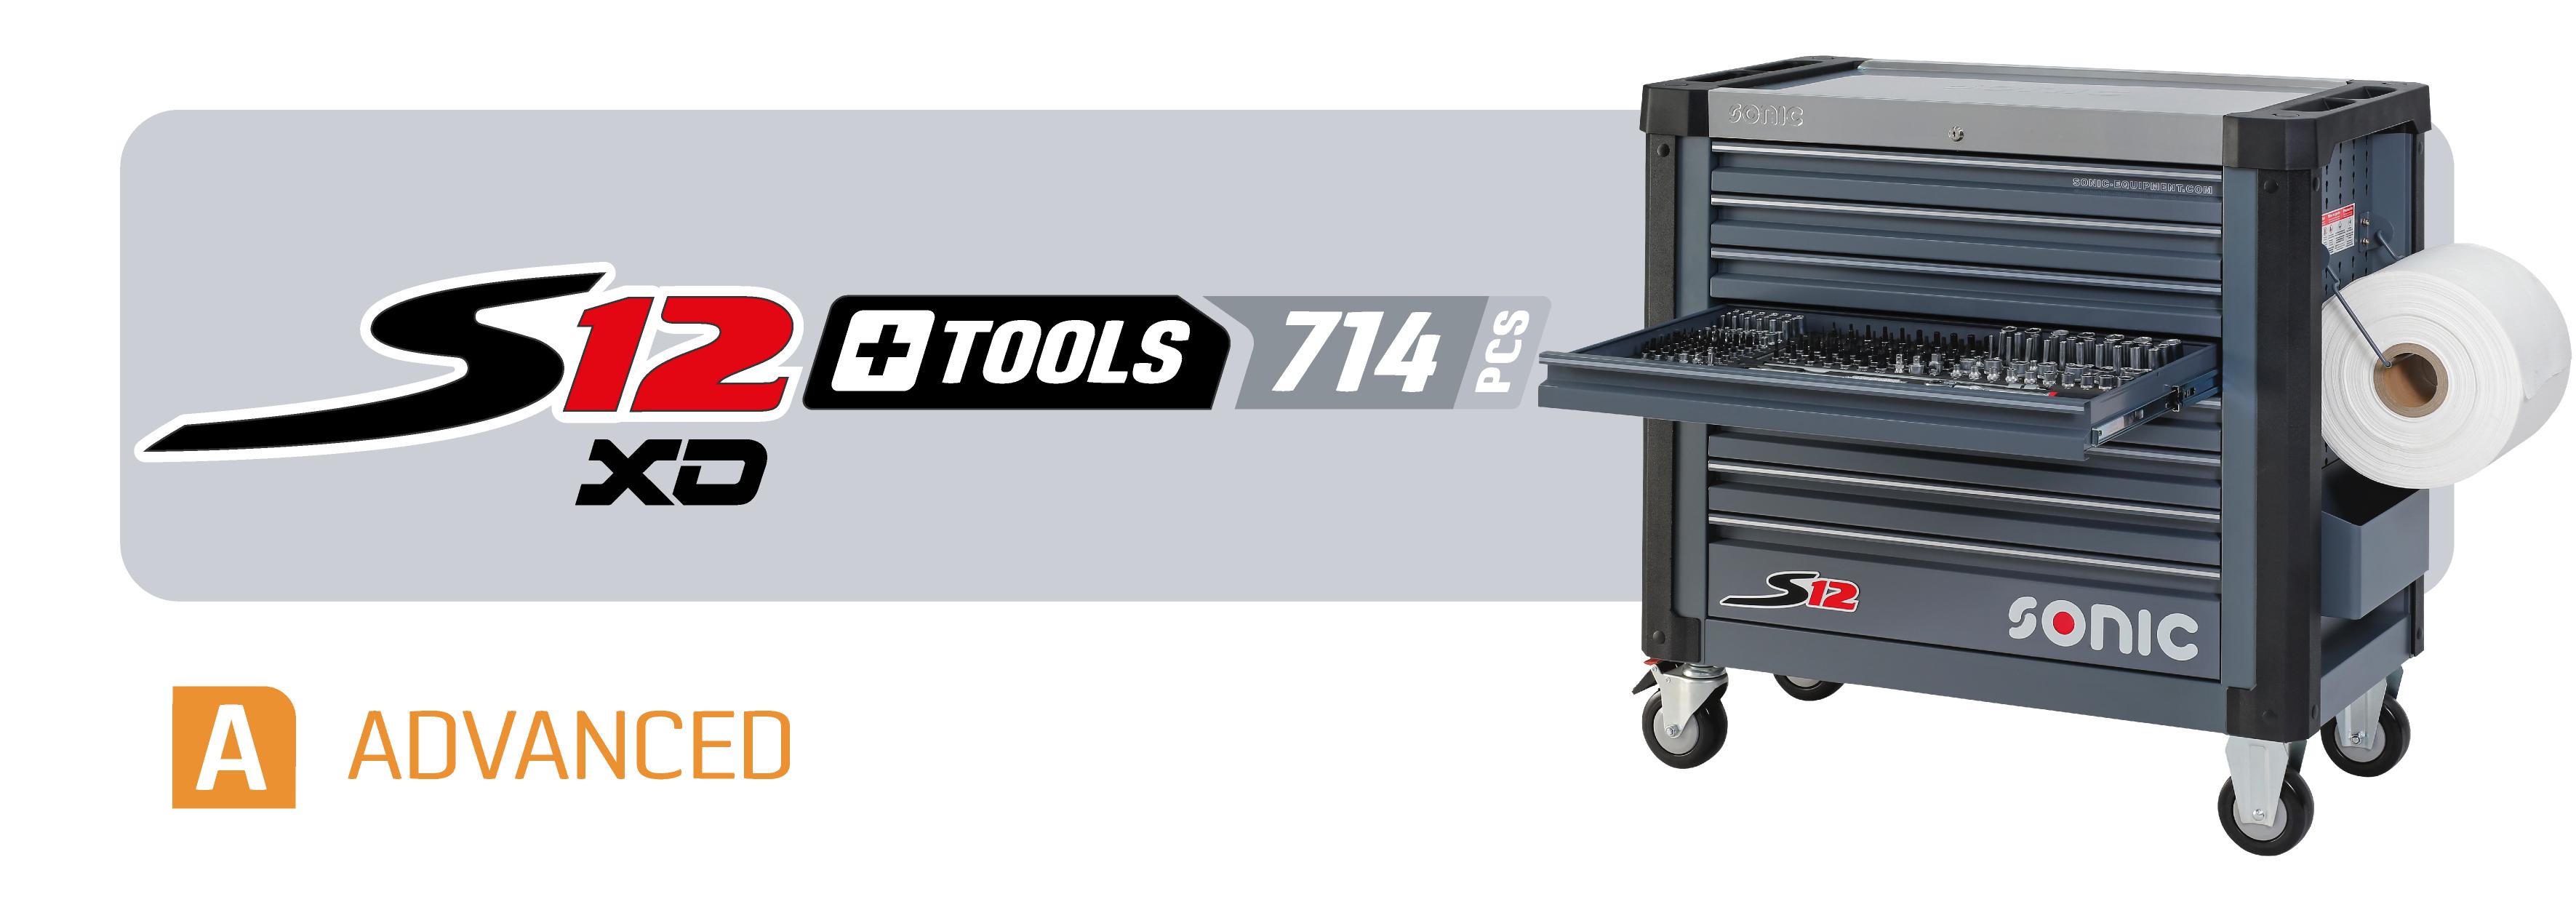 S12 XD工具箱与工具